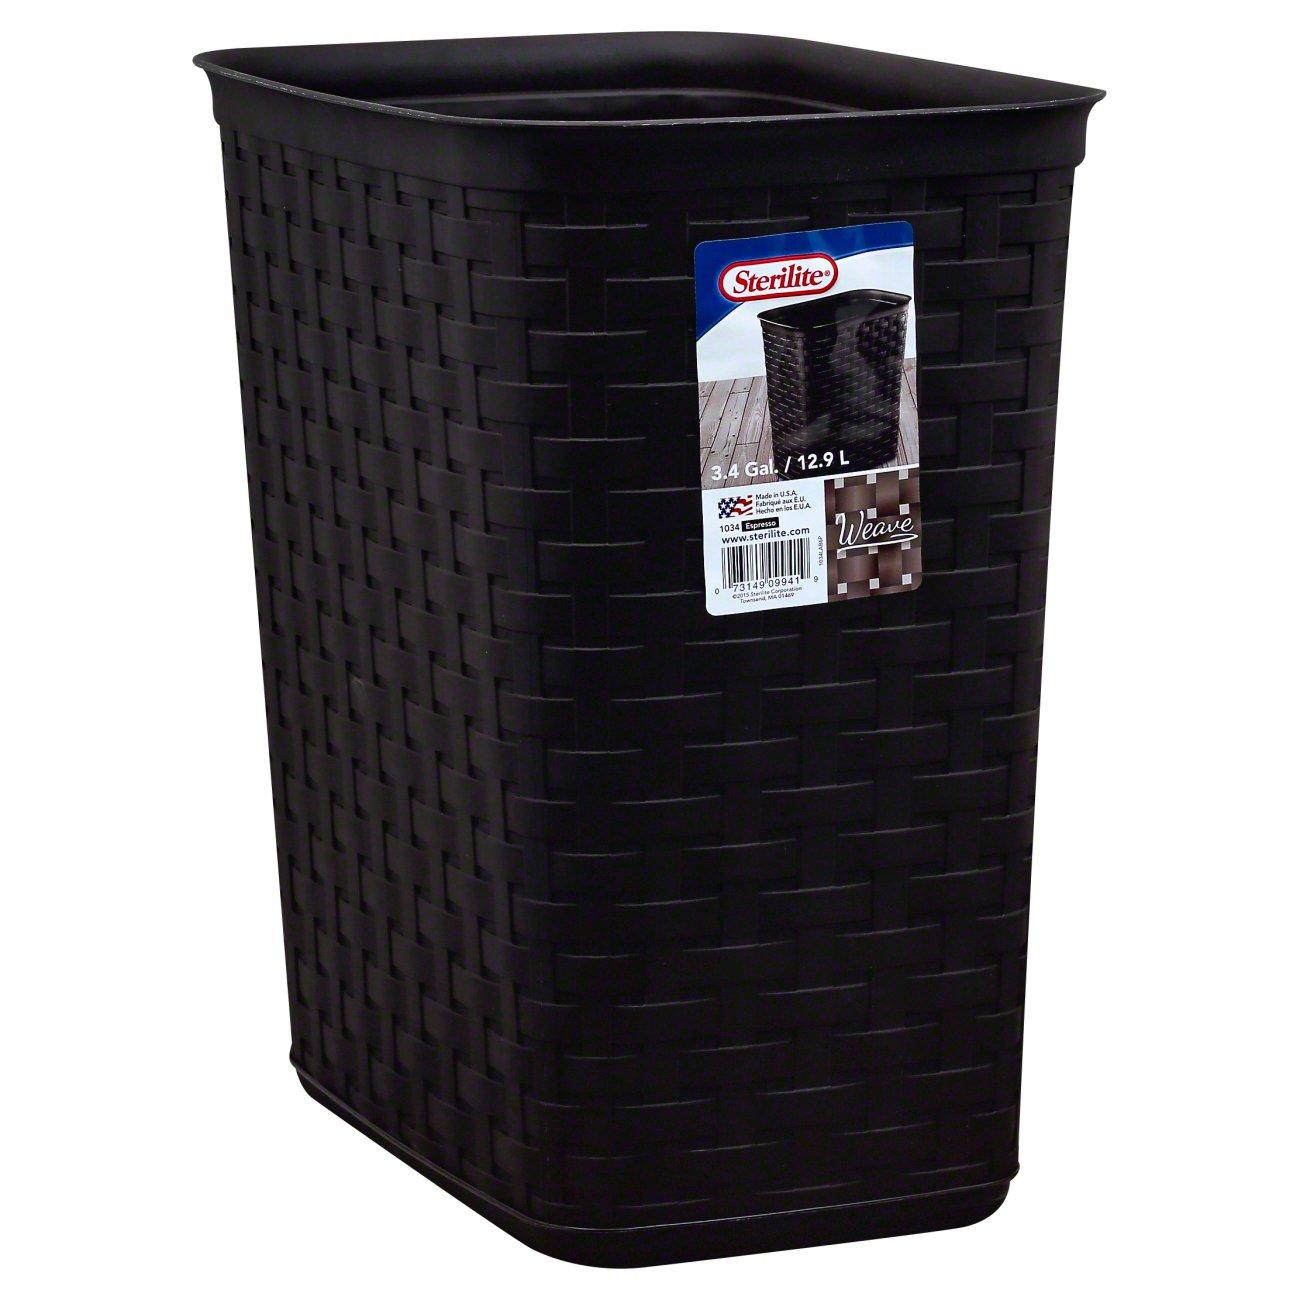 Sterilite Weave Waste Basket Shop Trash Cans At H E B